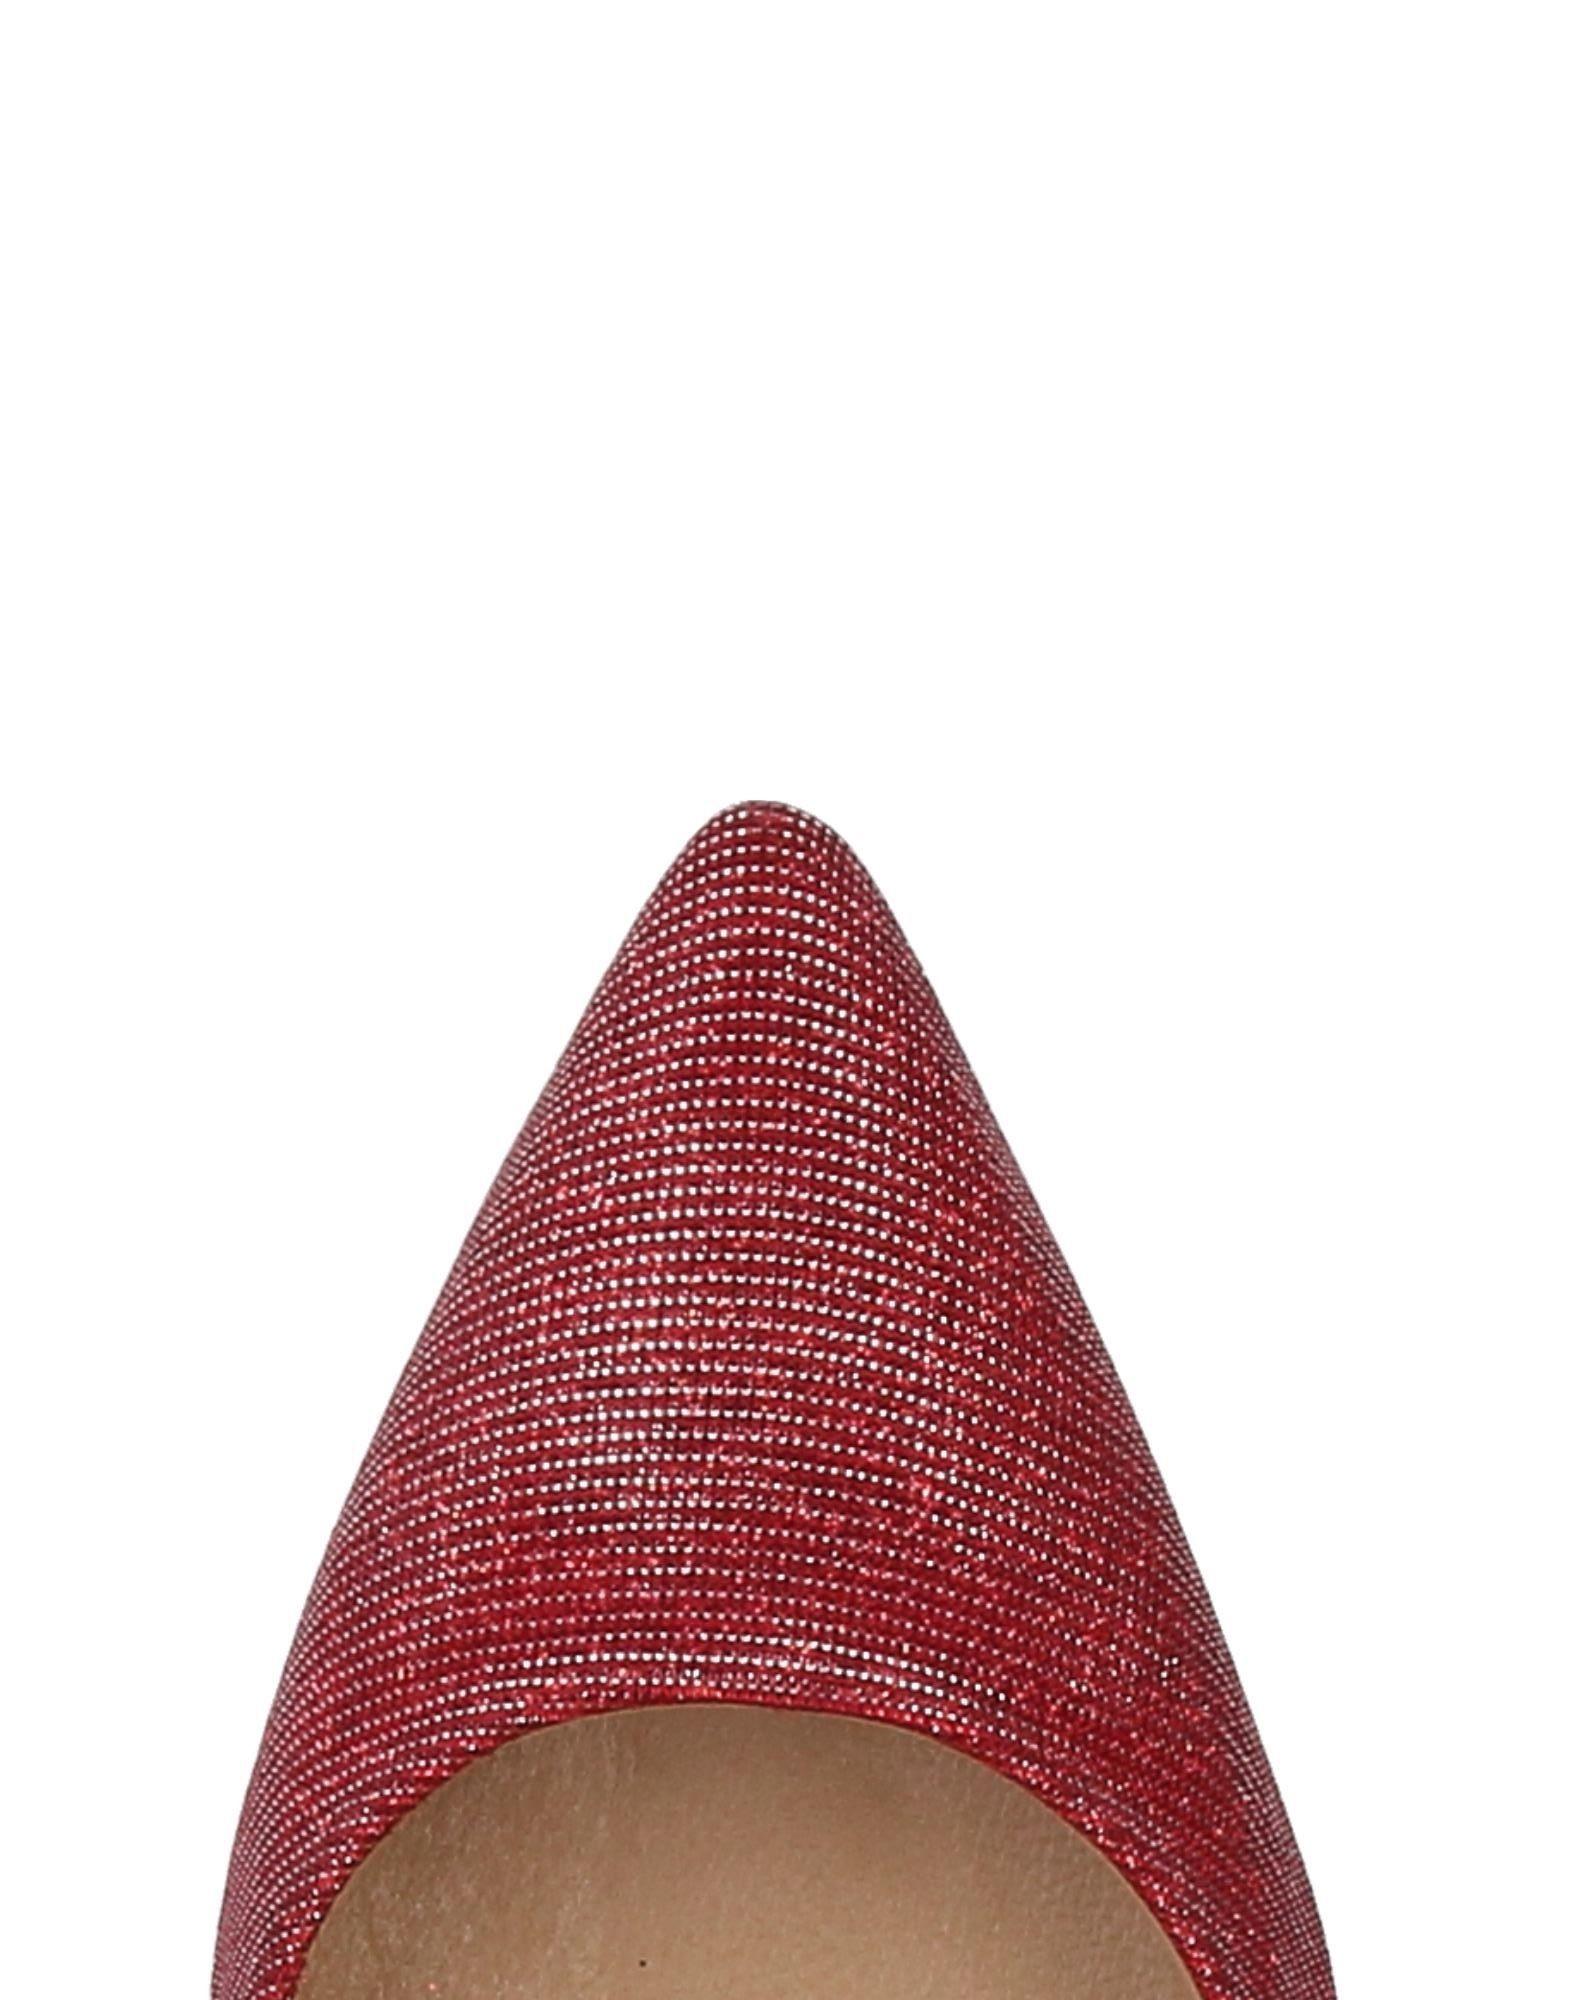 L arianna Pumps 11134099HB Damen 11134099HB Pumps Gute Qualität beliebte Schuhe af5dab